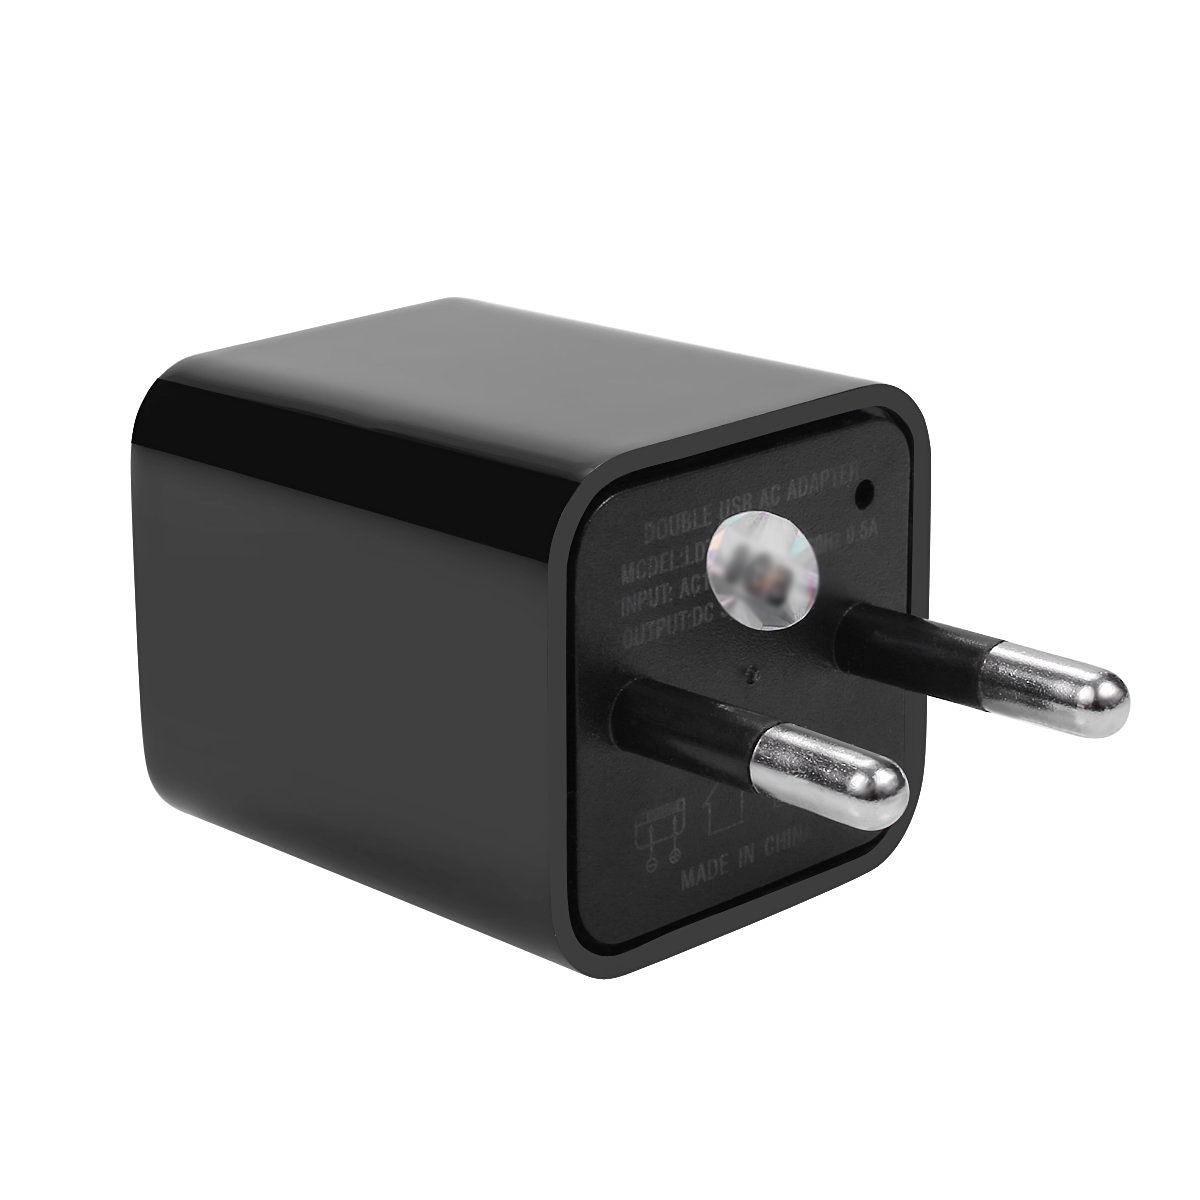 handy netzteil stromadapter spycam mini berwachung. Black Bedroom Furniture Sets. Home Design Ideas